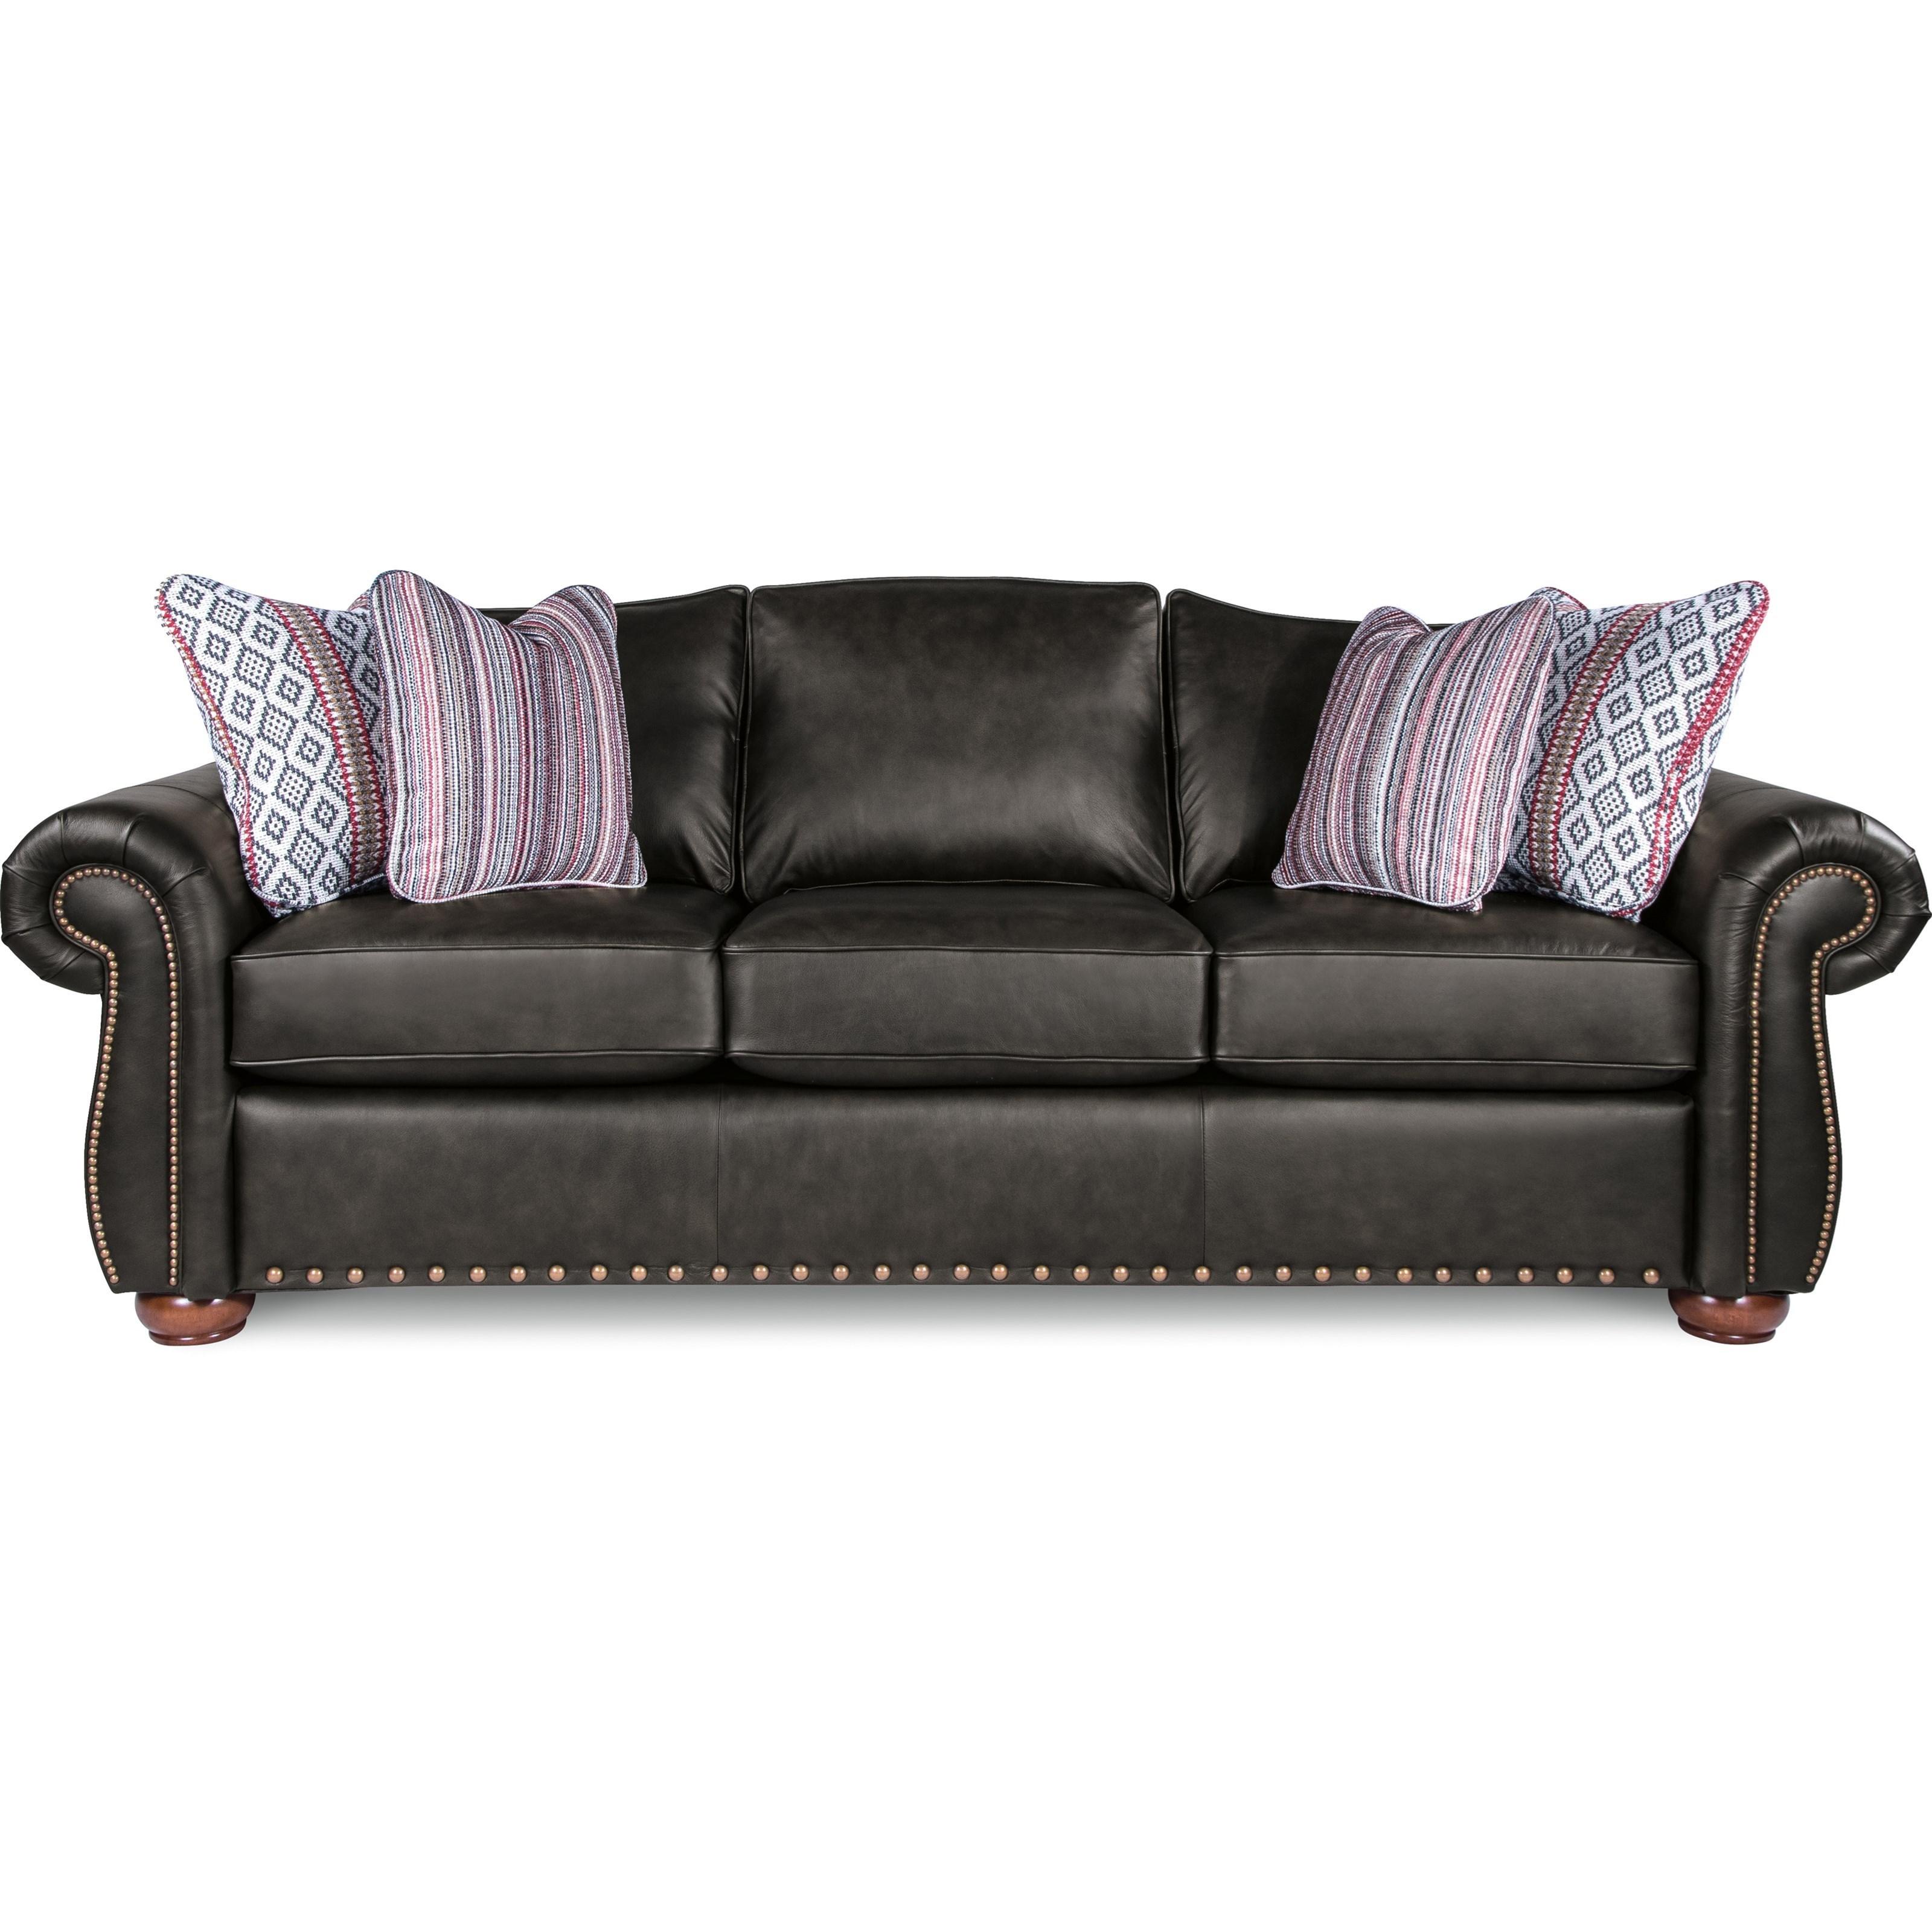 Charmant La Z Boy WalesLa Z Boy® Premier Sofa ...